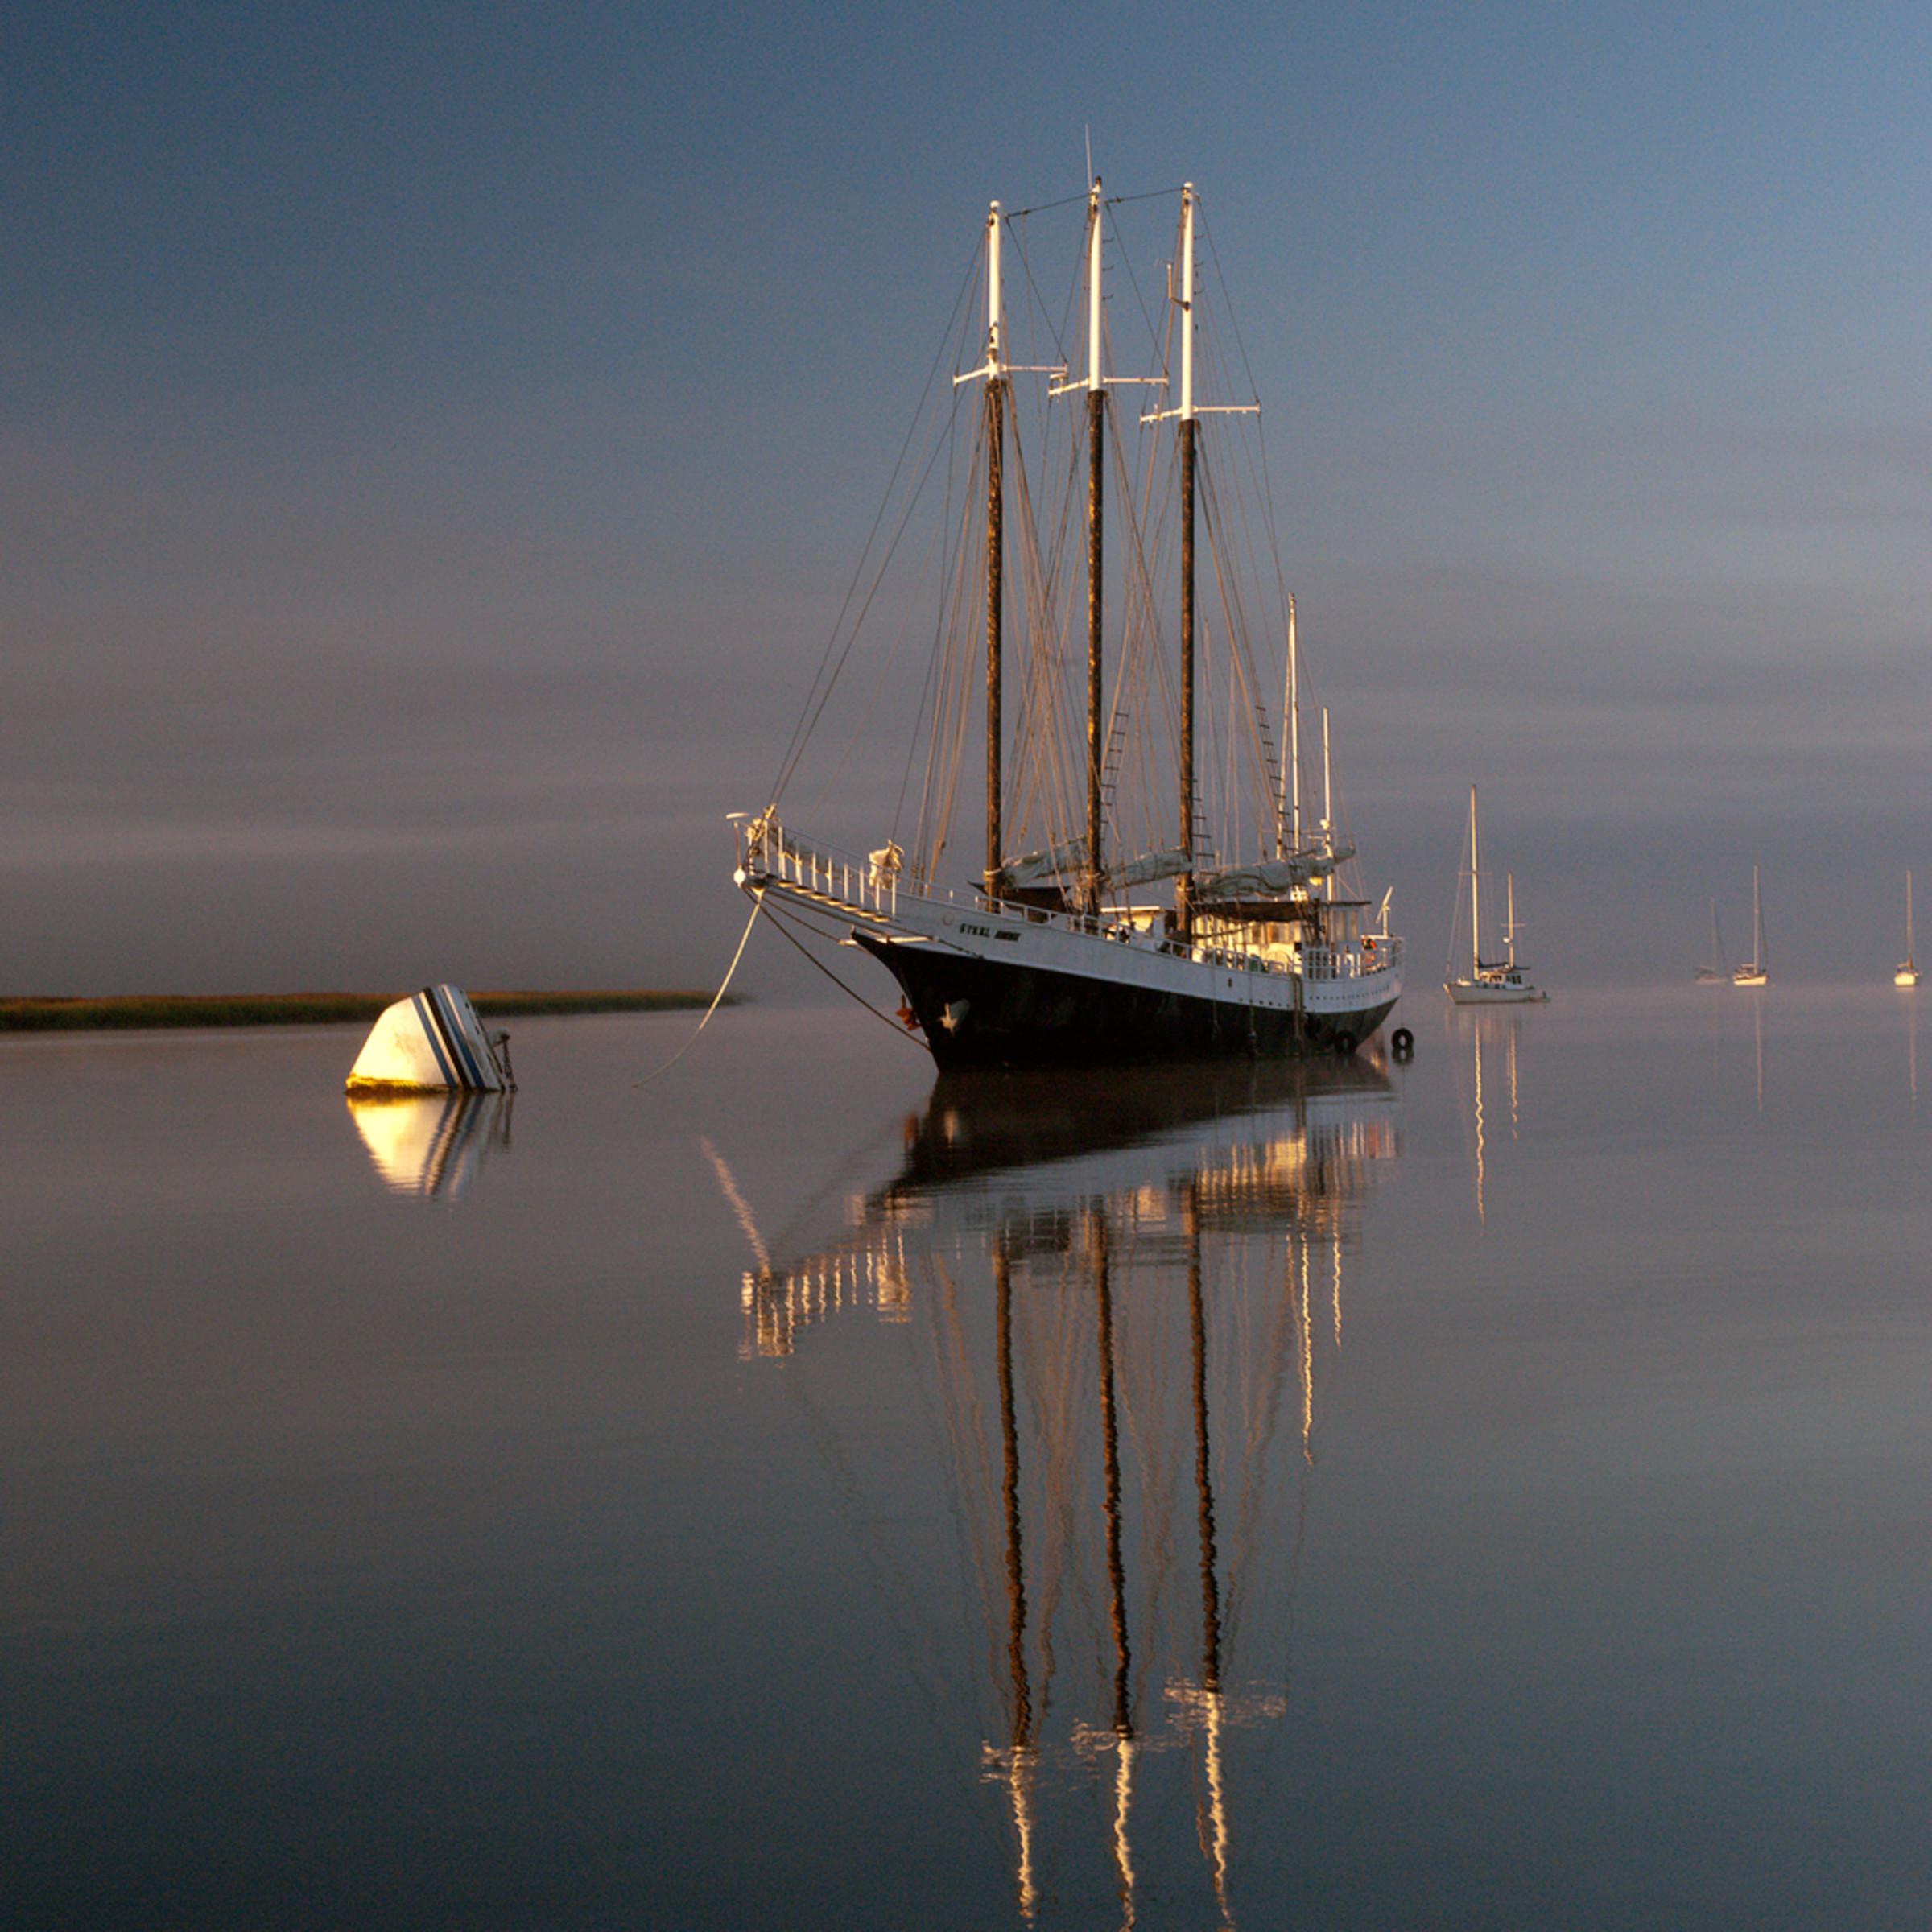 Reflect in the stillness orhee1